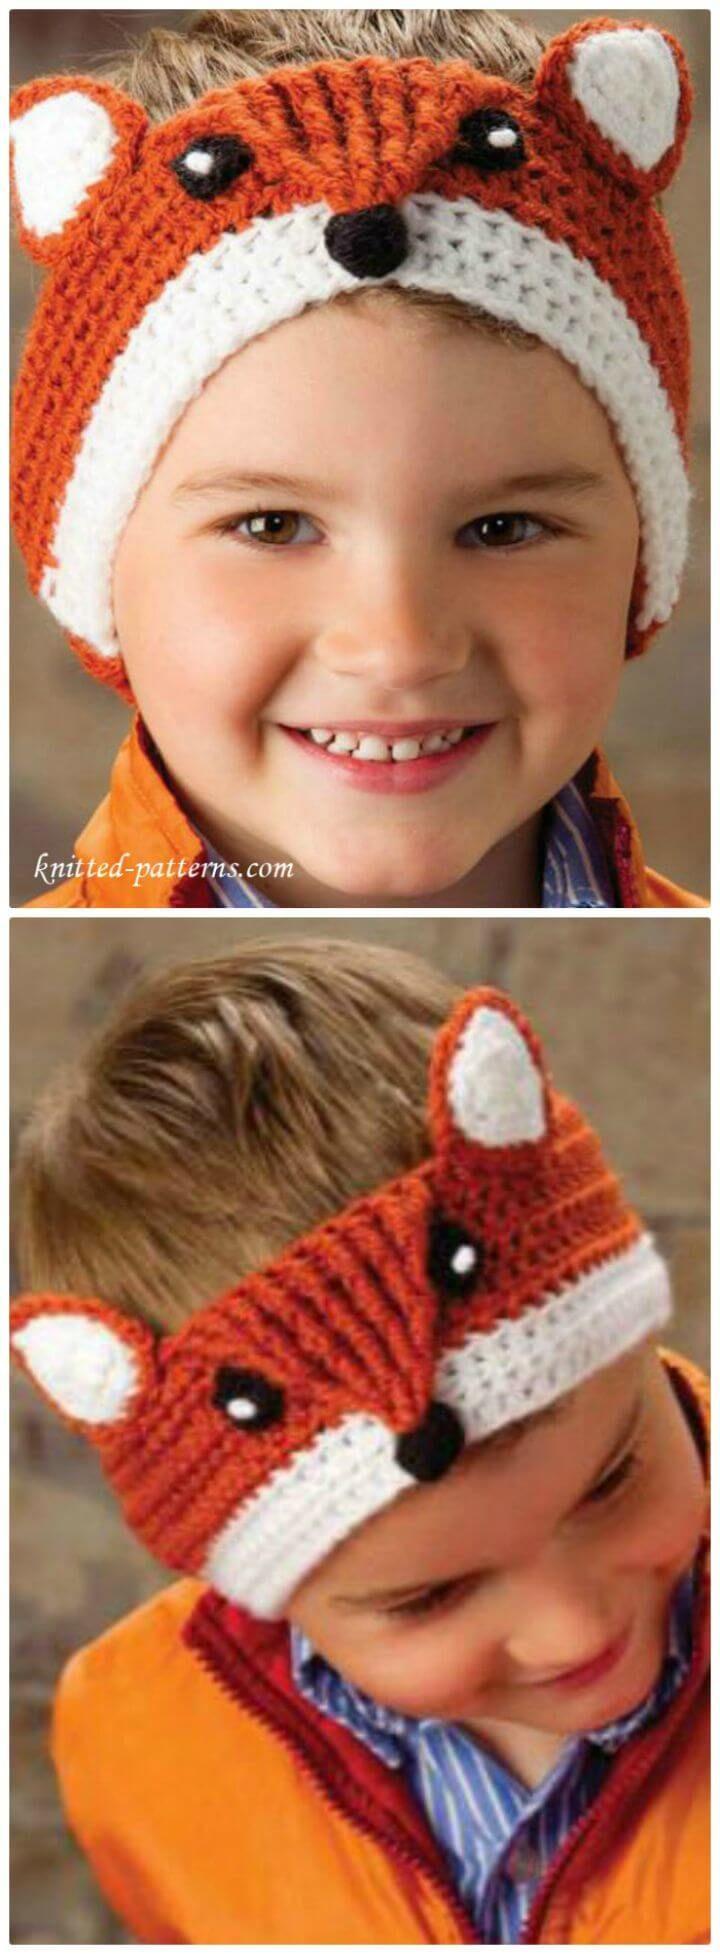 50 Free Crochet Fox Patterns - Crochet Fox Hat - Page 2 of 3 - DIY & Crafts